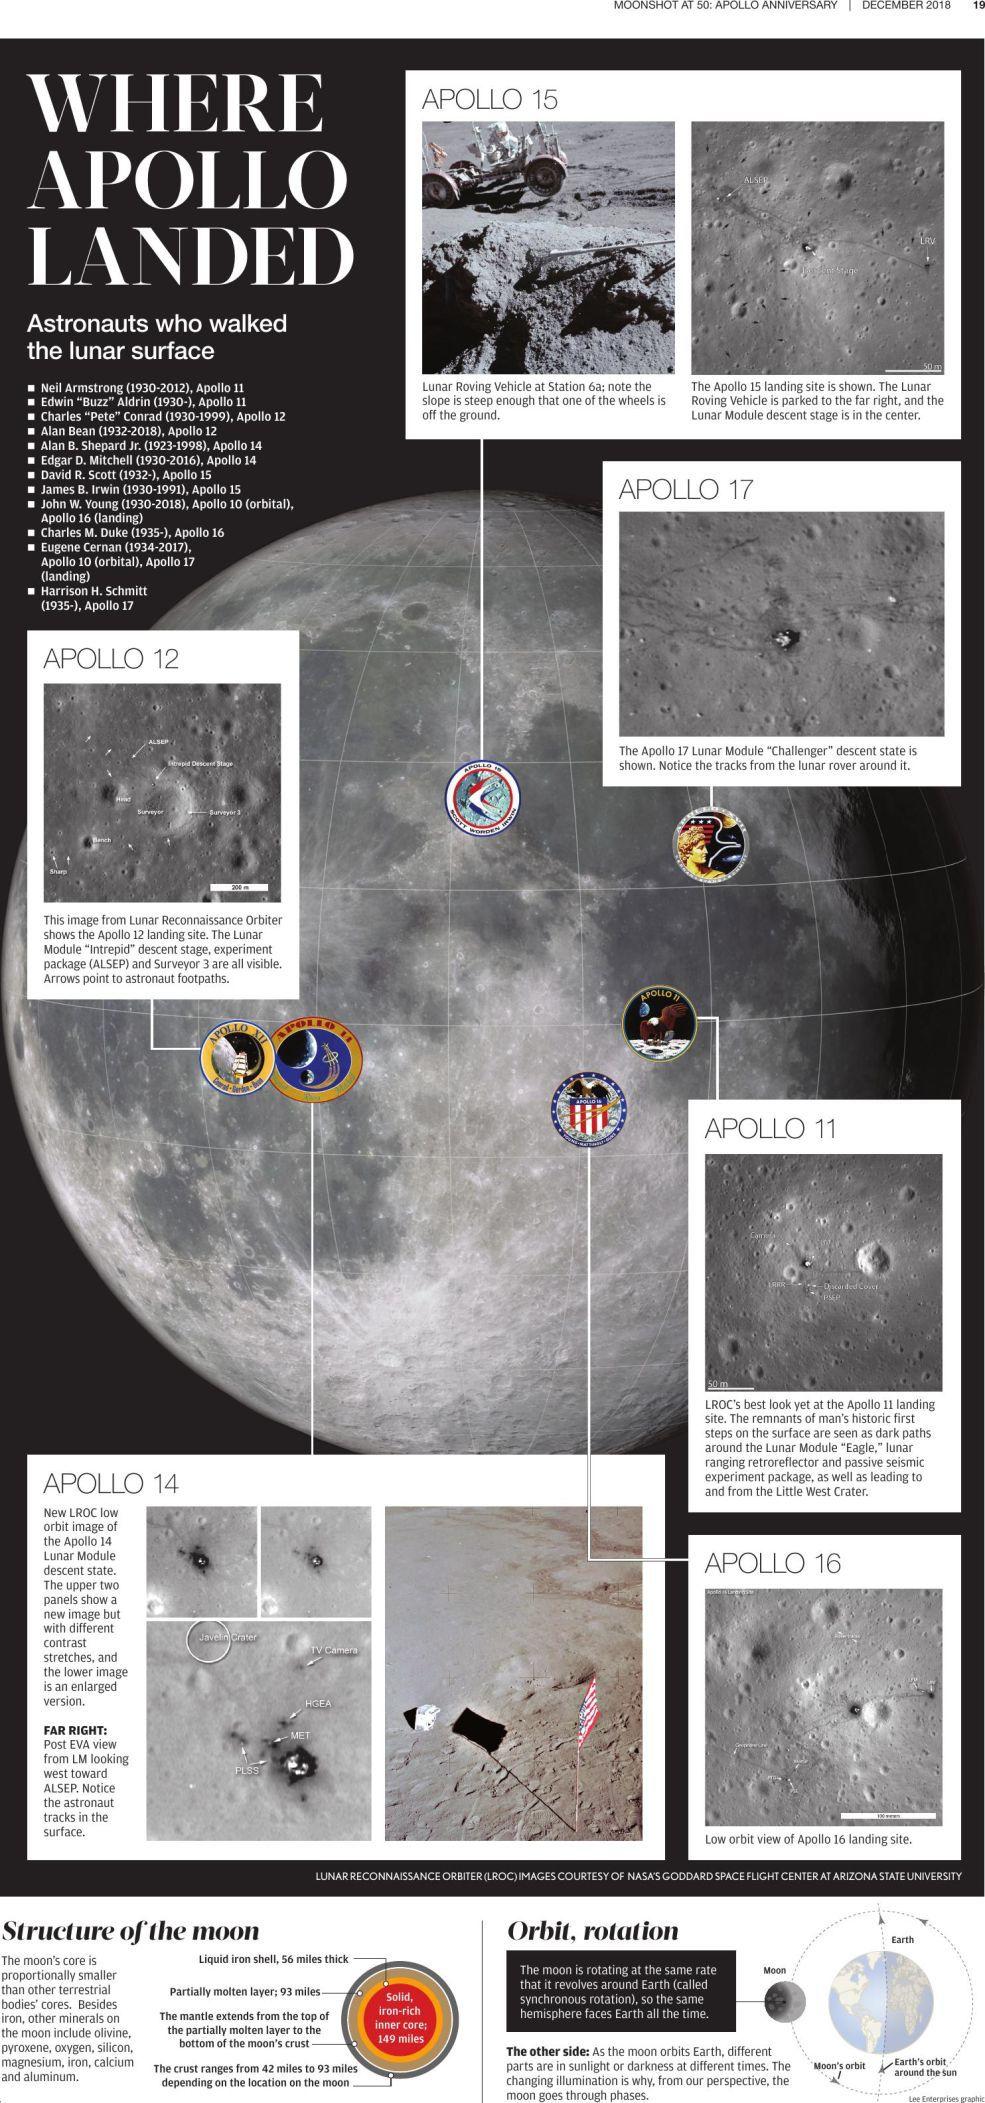 Moon landing mission highights